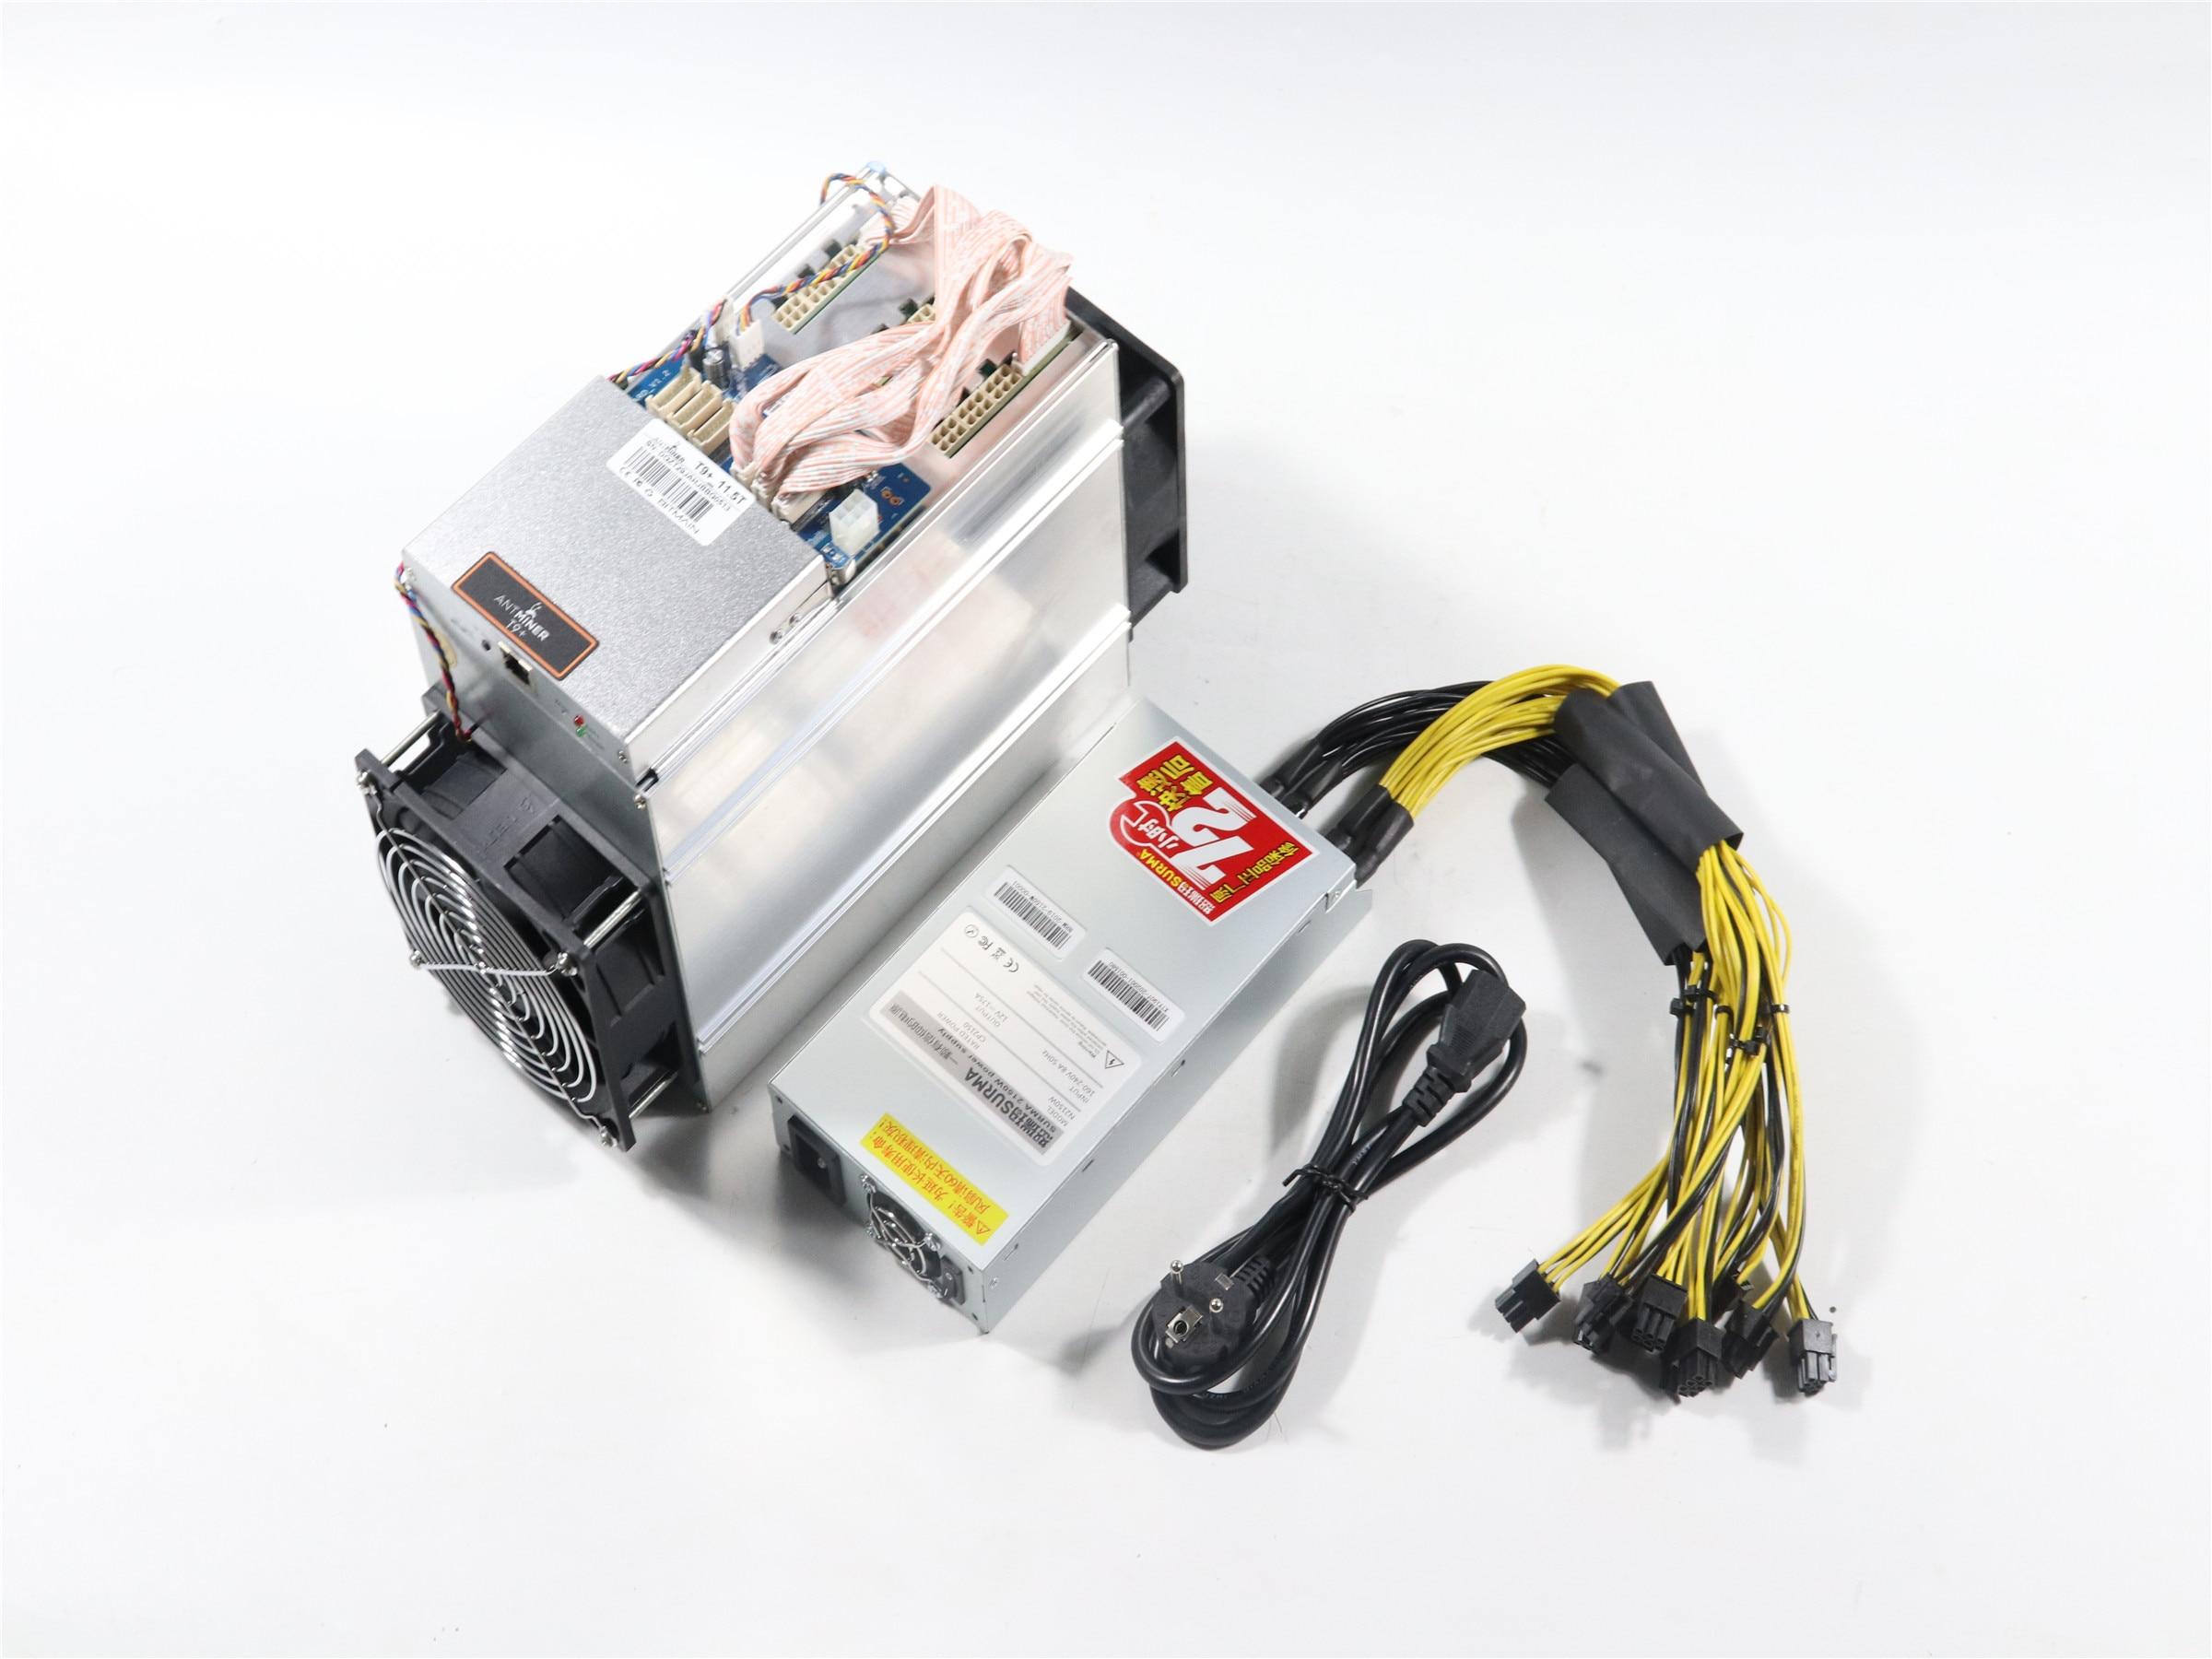 New Antminer T9 + 11.5T com (2150w PSU) BCH Econômico Do Que Antminer Mineiro BTC S9 S9k S9SE S11 S15 S17Whasminer M3